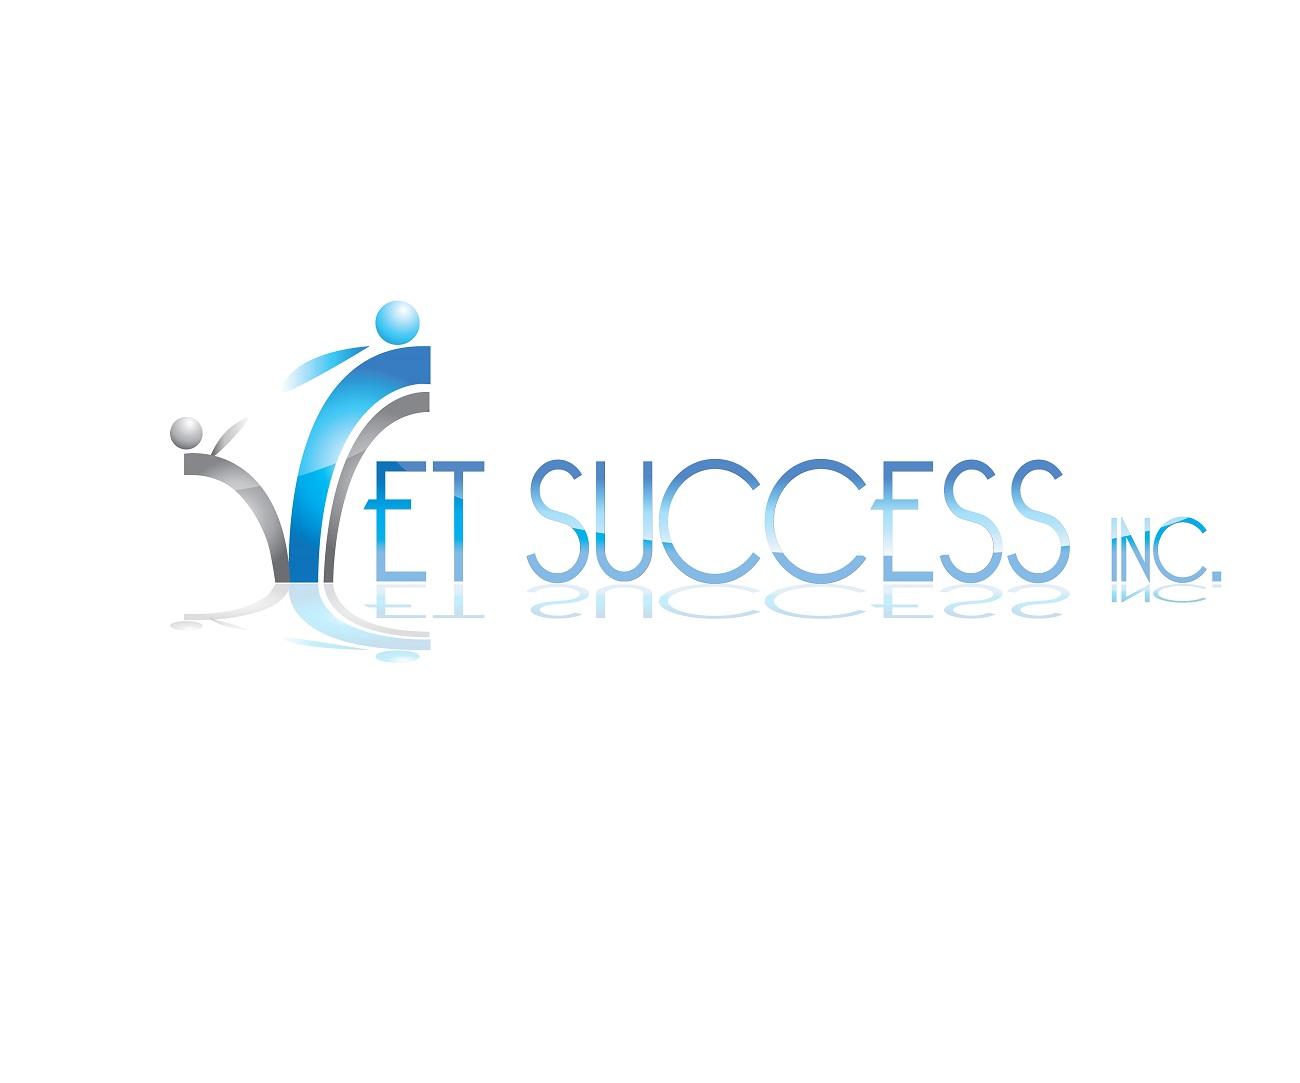 Logo Design by jhunzkie24 - Entry No. 52 in the Logo Design Contest Imaginative Logo Design for Vet Success Inc..